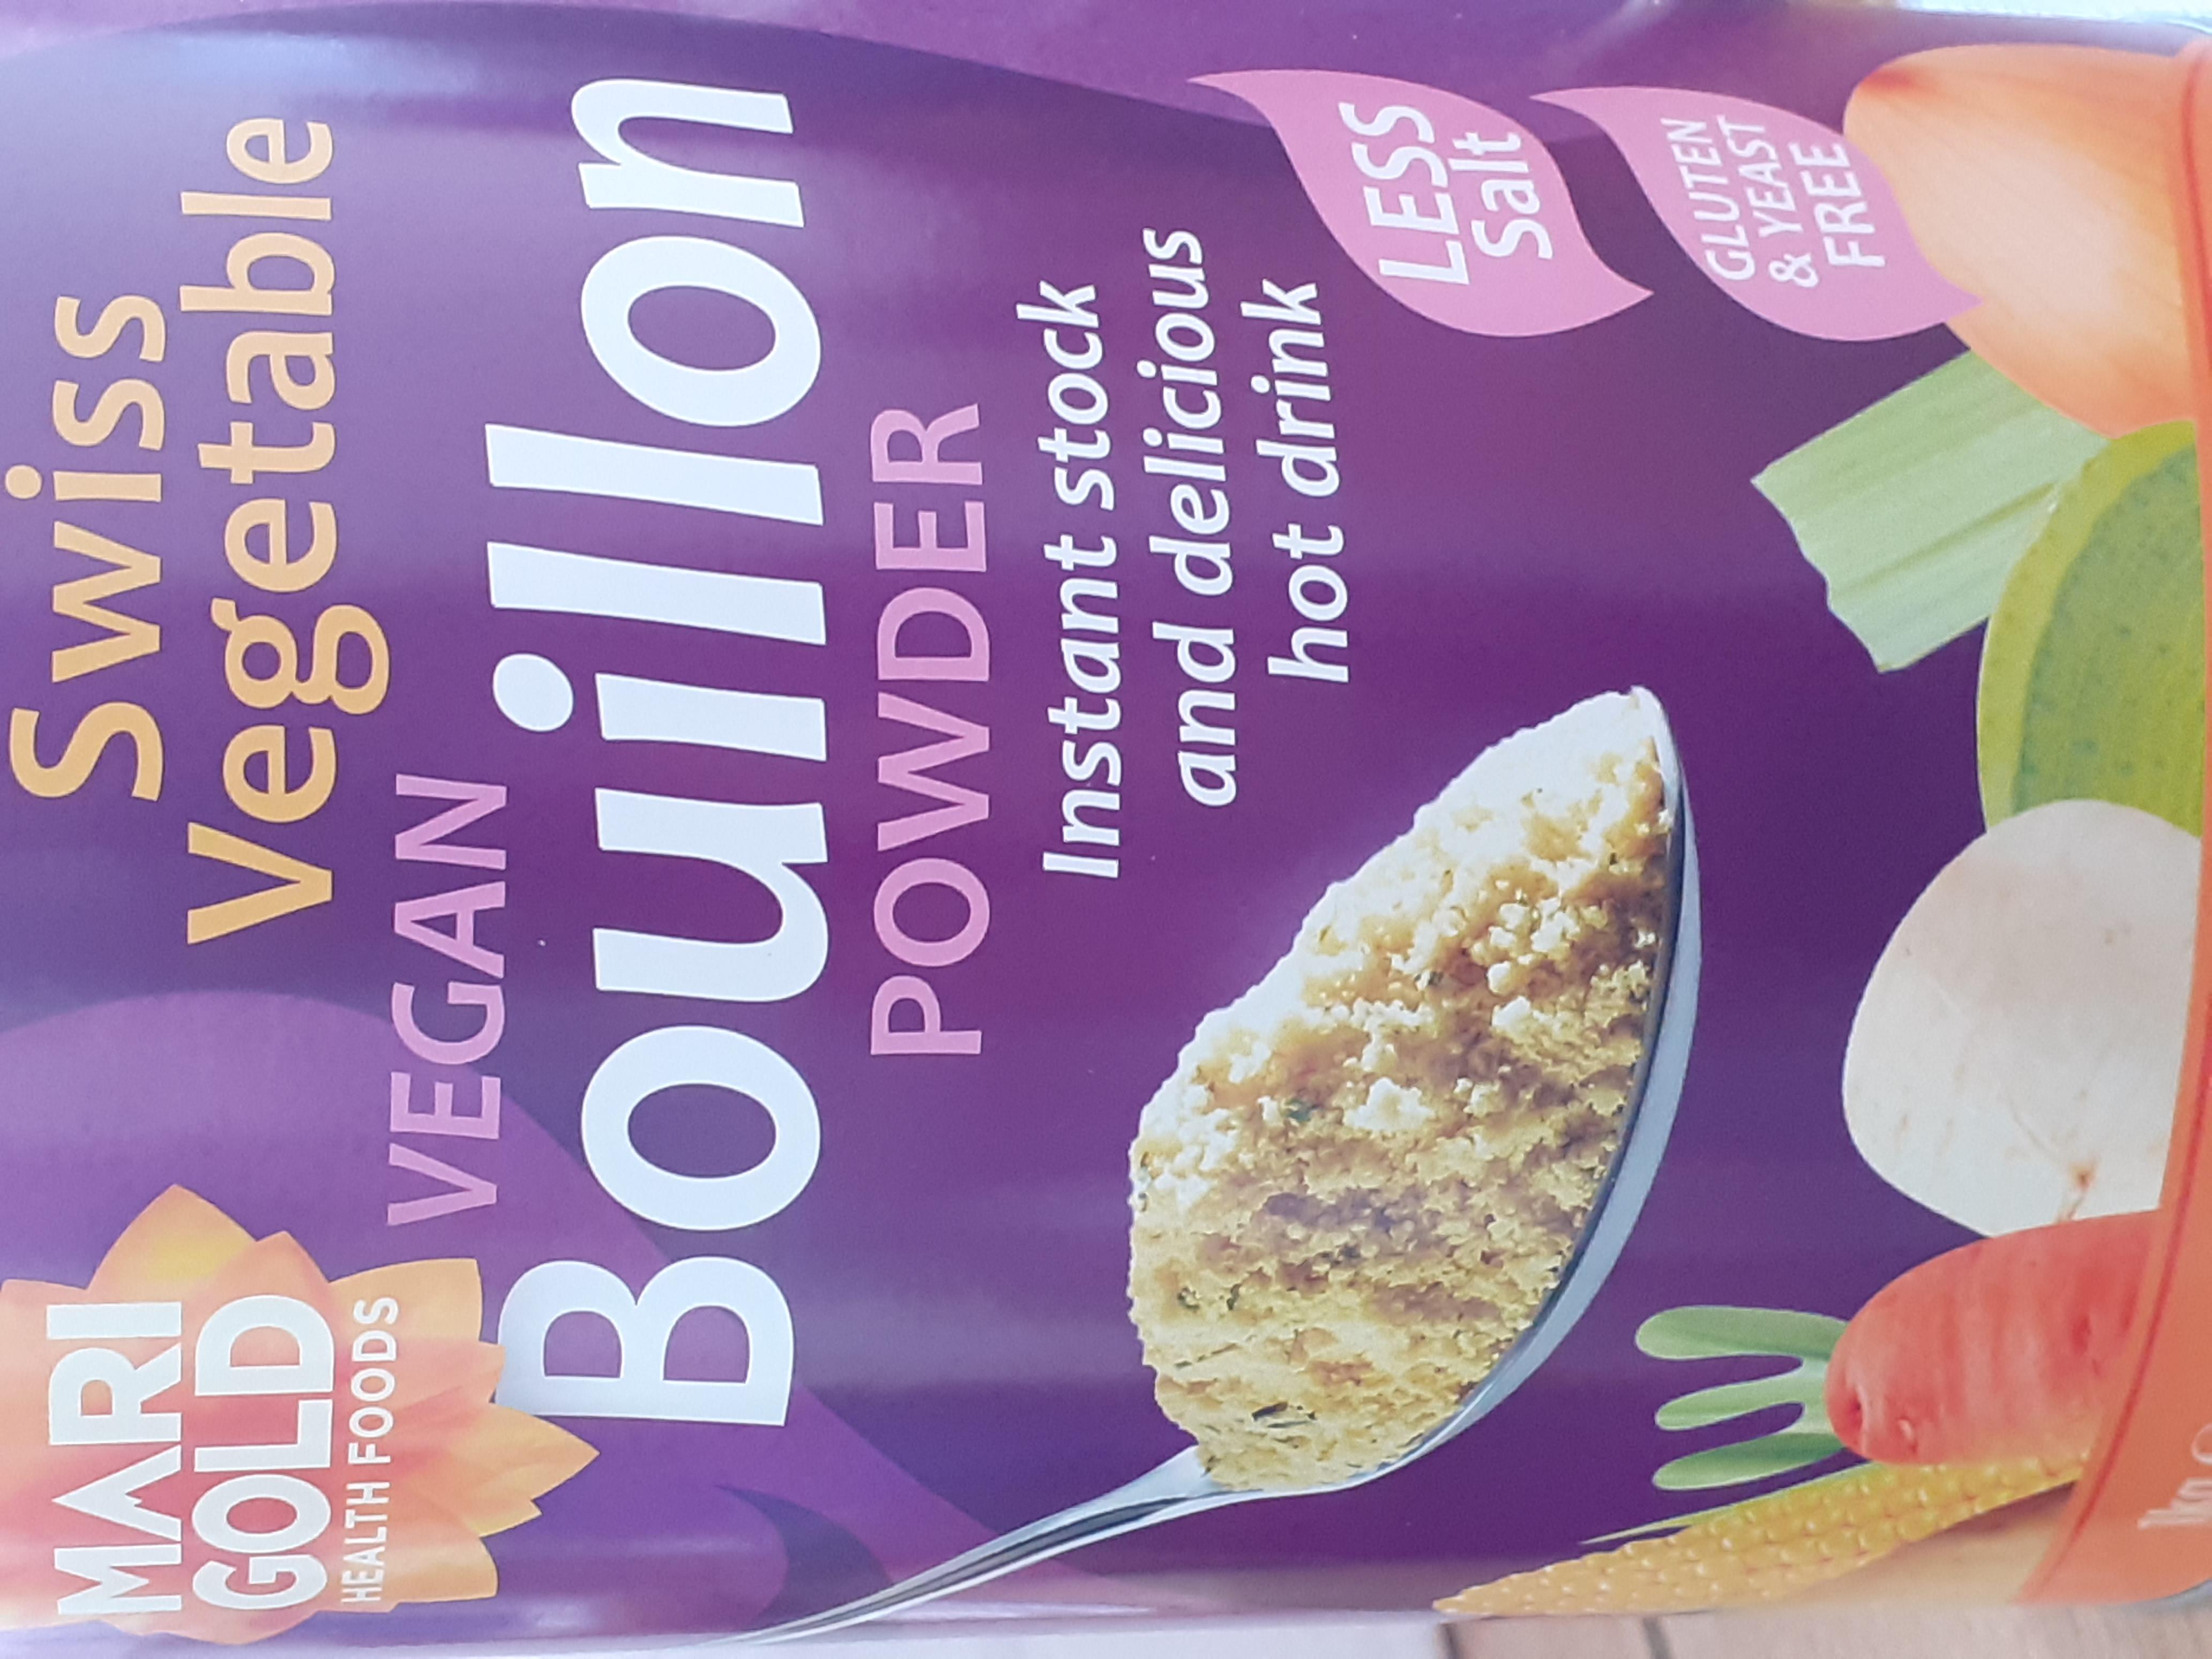 Bouillon - Vegan - Low Salt - Gluten Free- Yeast Free per 50g